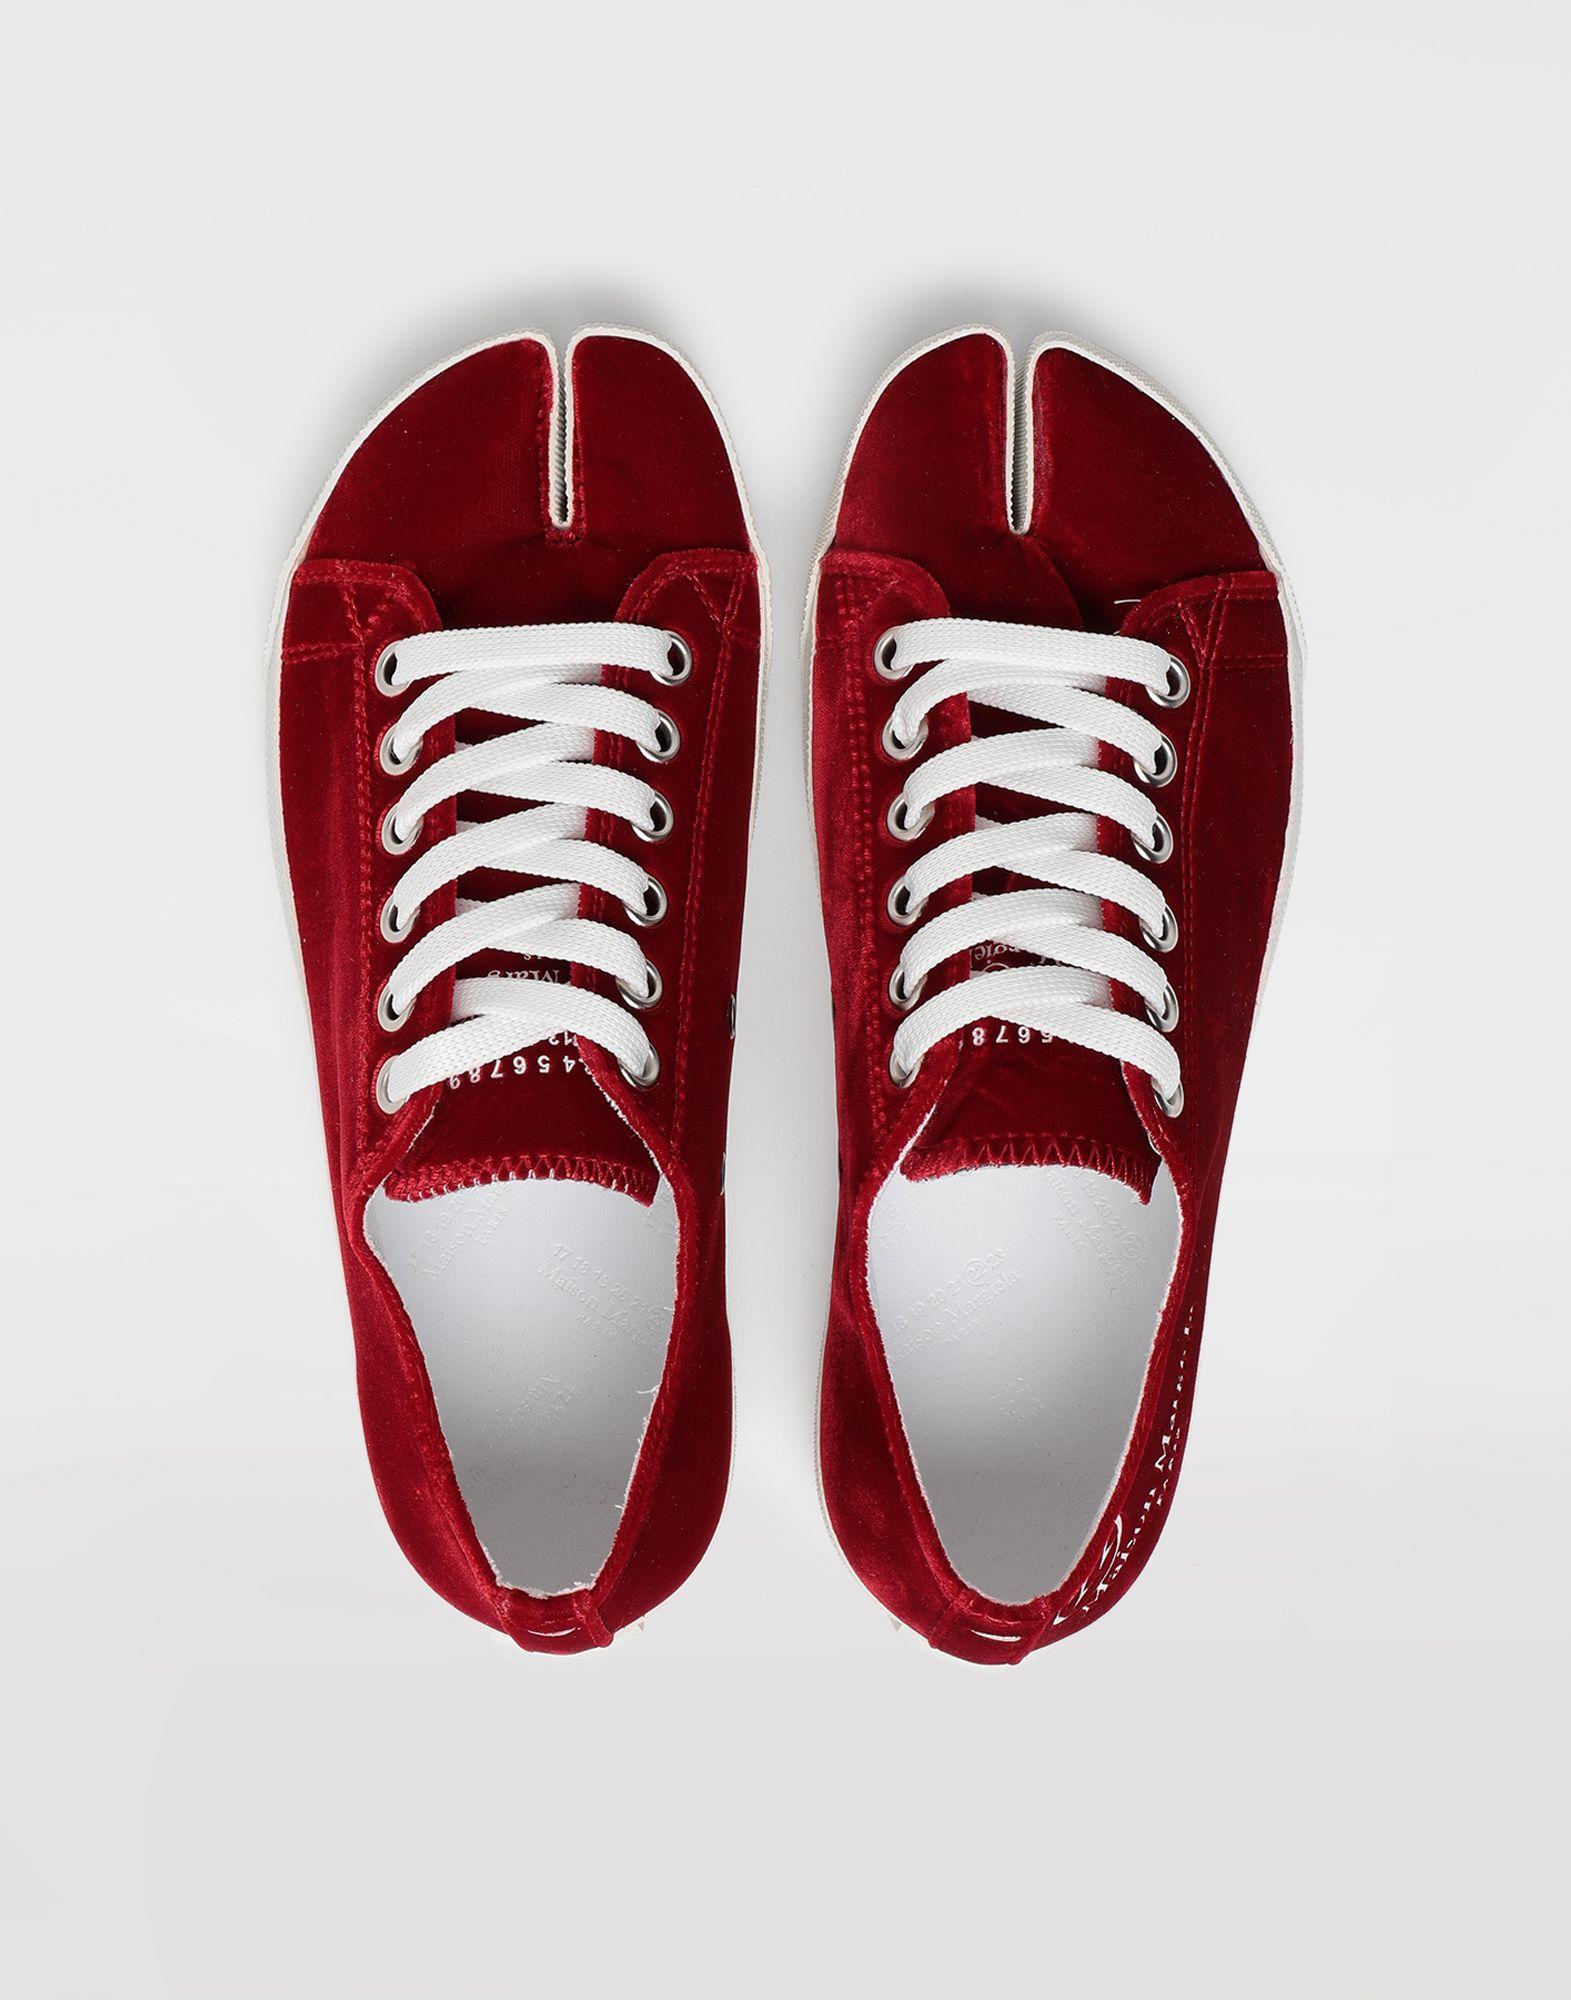 MAISON MARGIELA Tabi velvet sneakers Sneakers Tabi Woman e